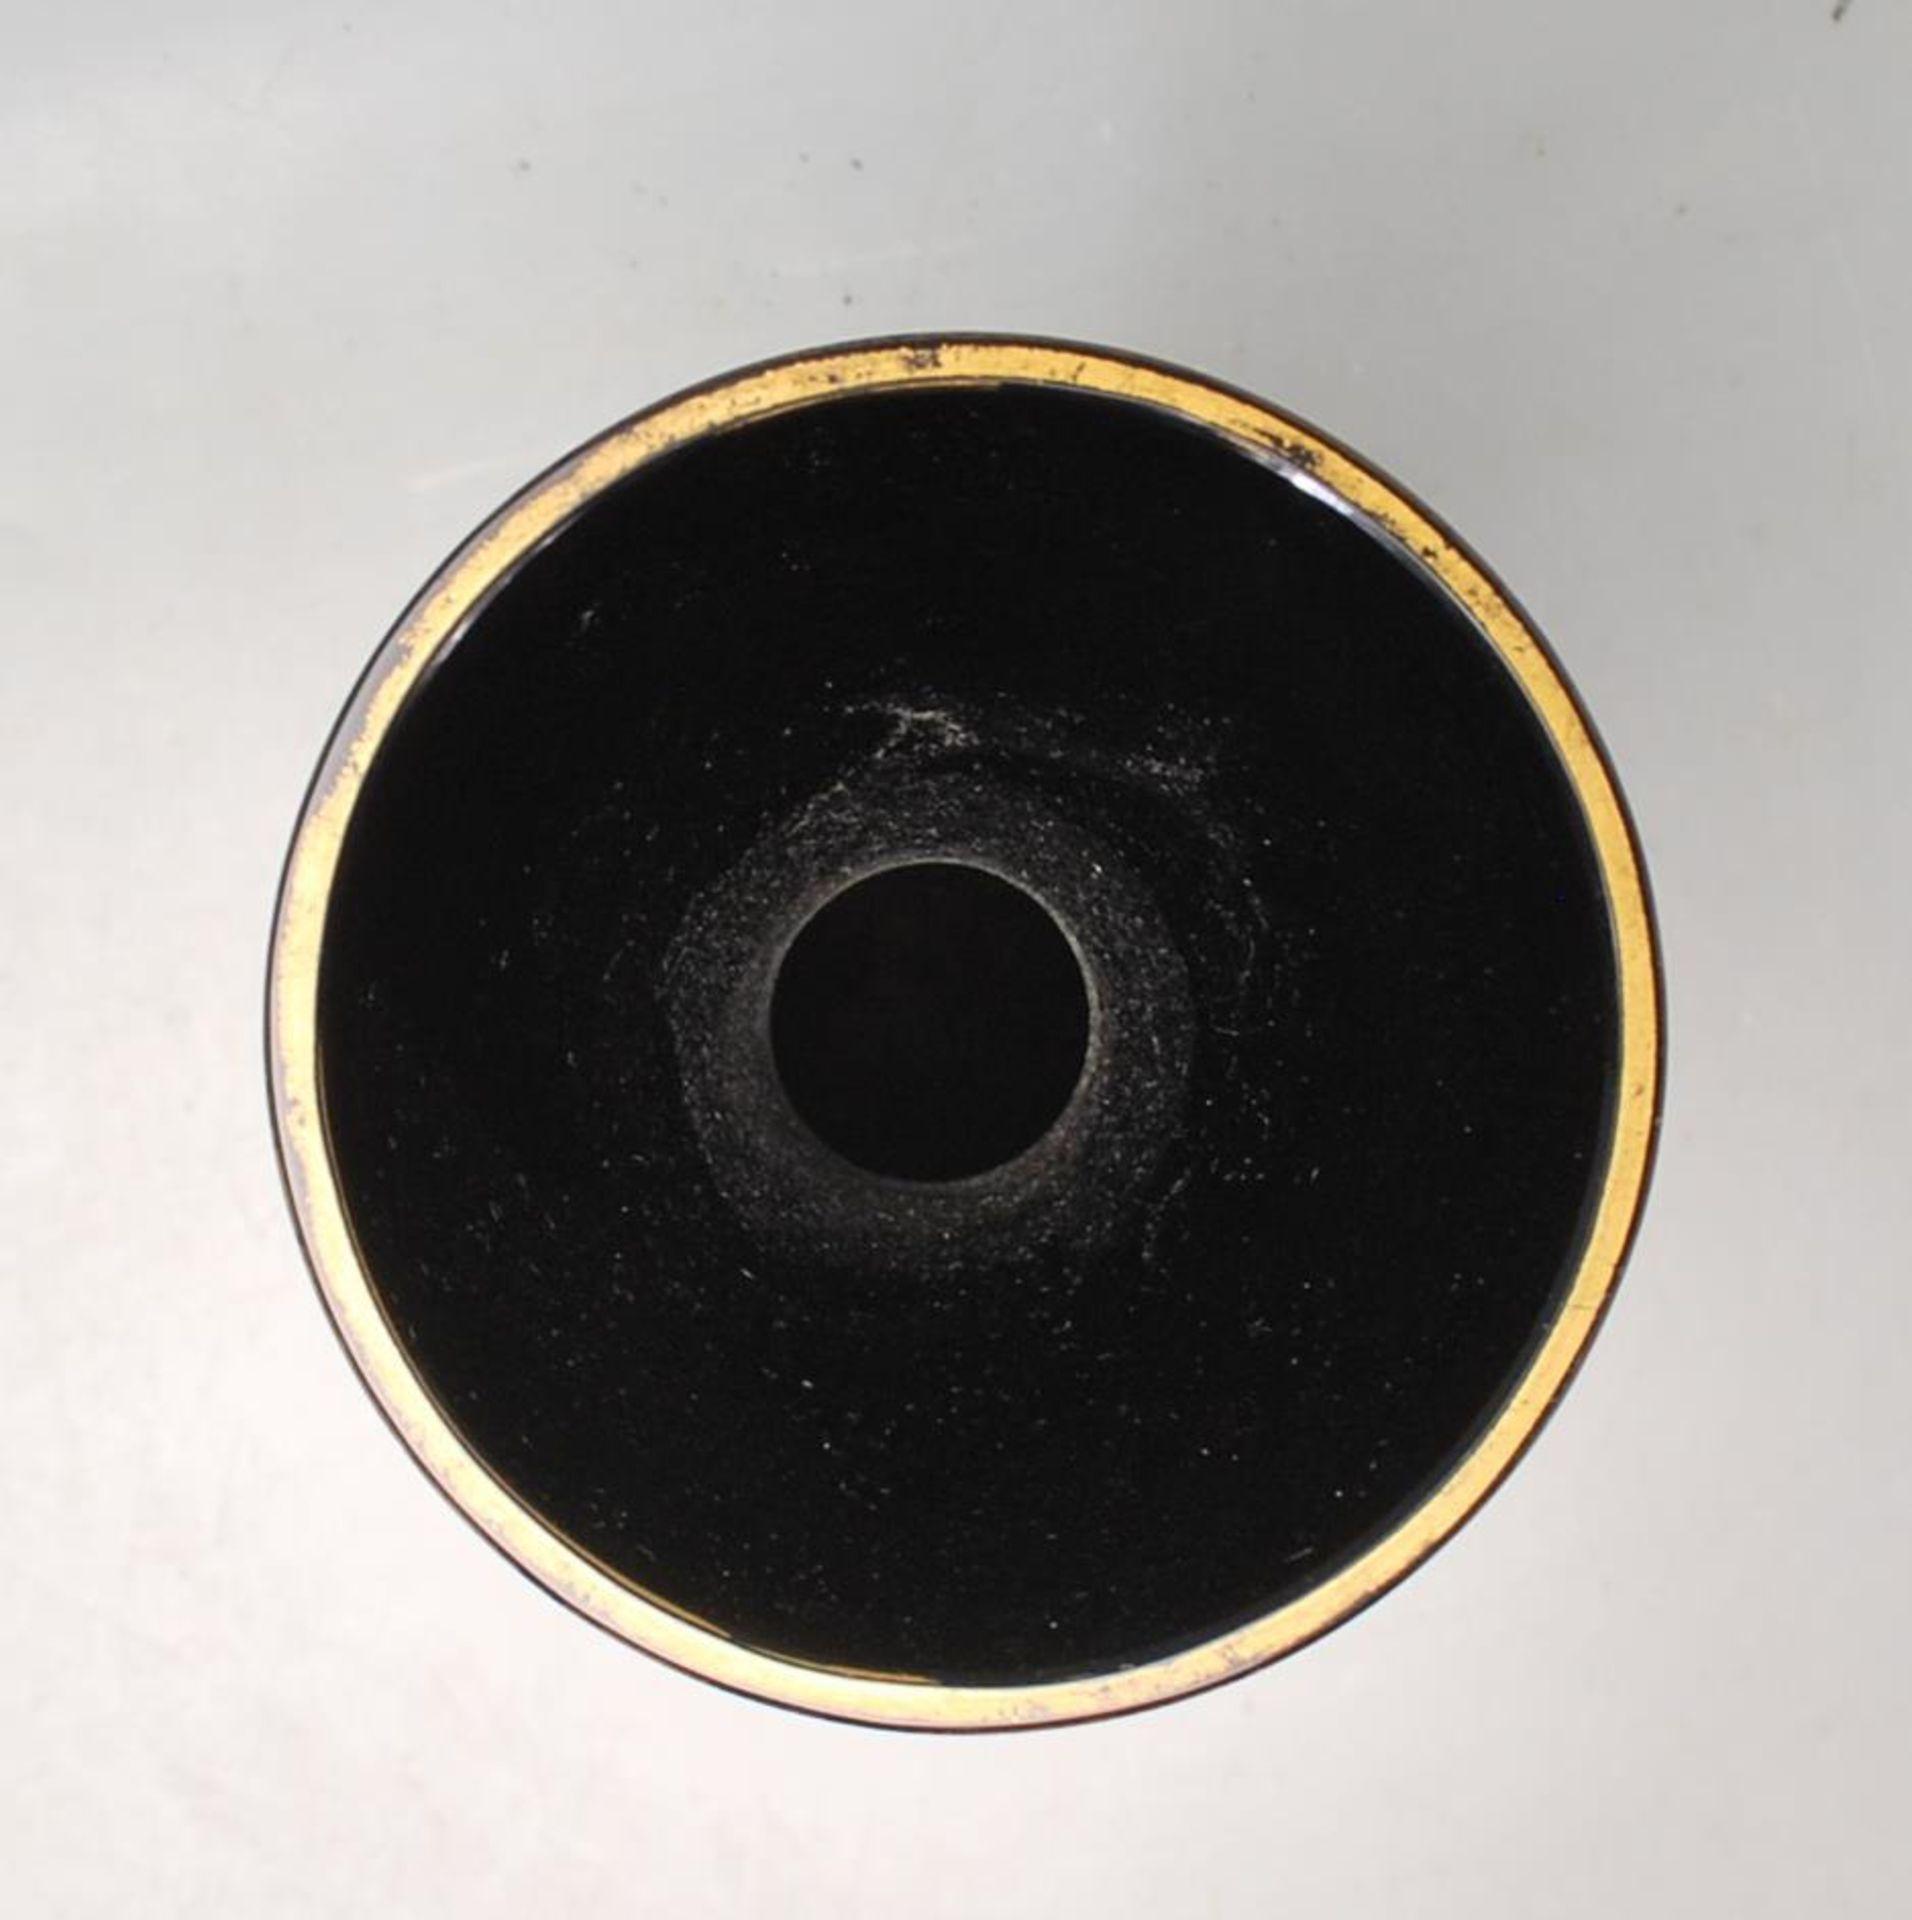 ANTIQUE BLACK AMETHYST BOHEMIAN GLASS VASE - Image 6 of 7